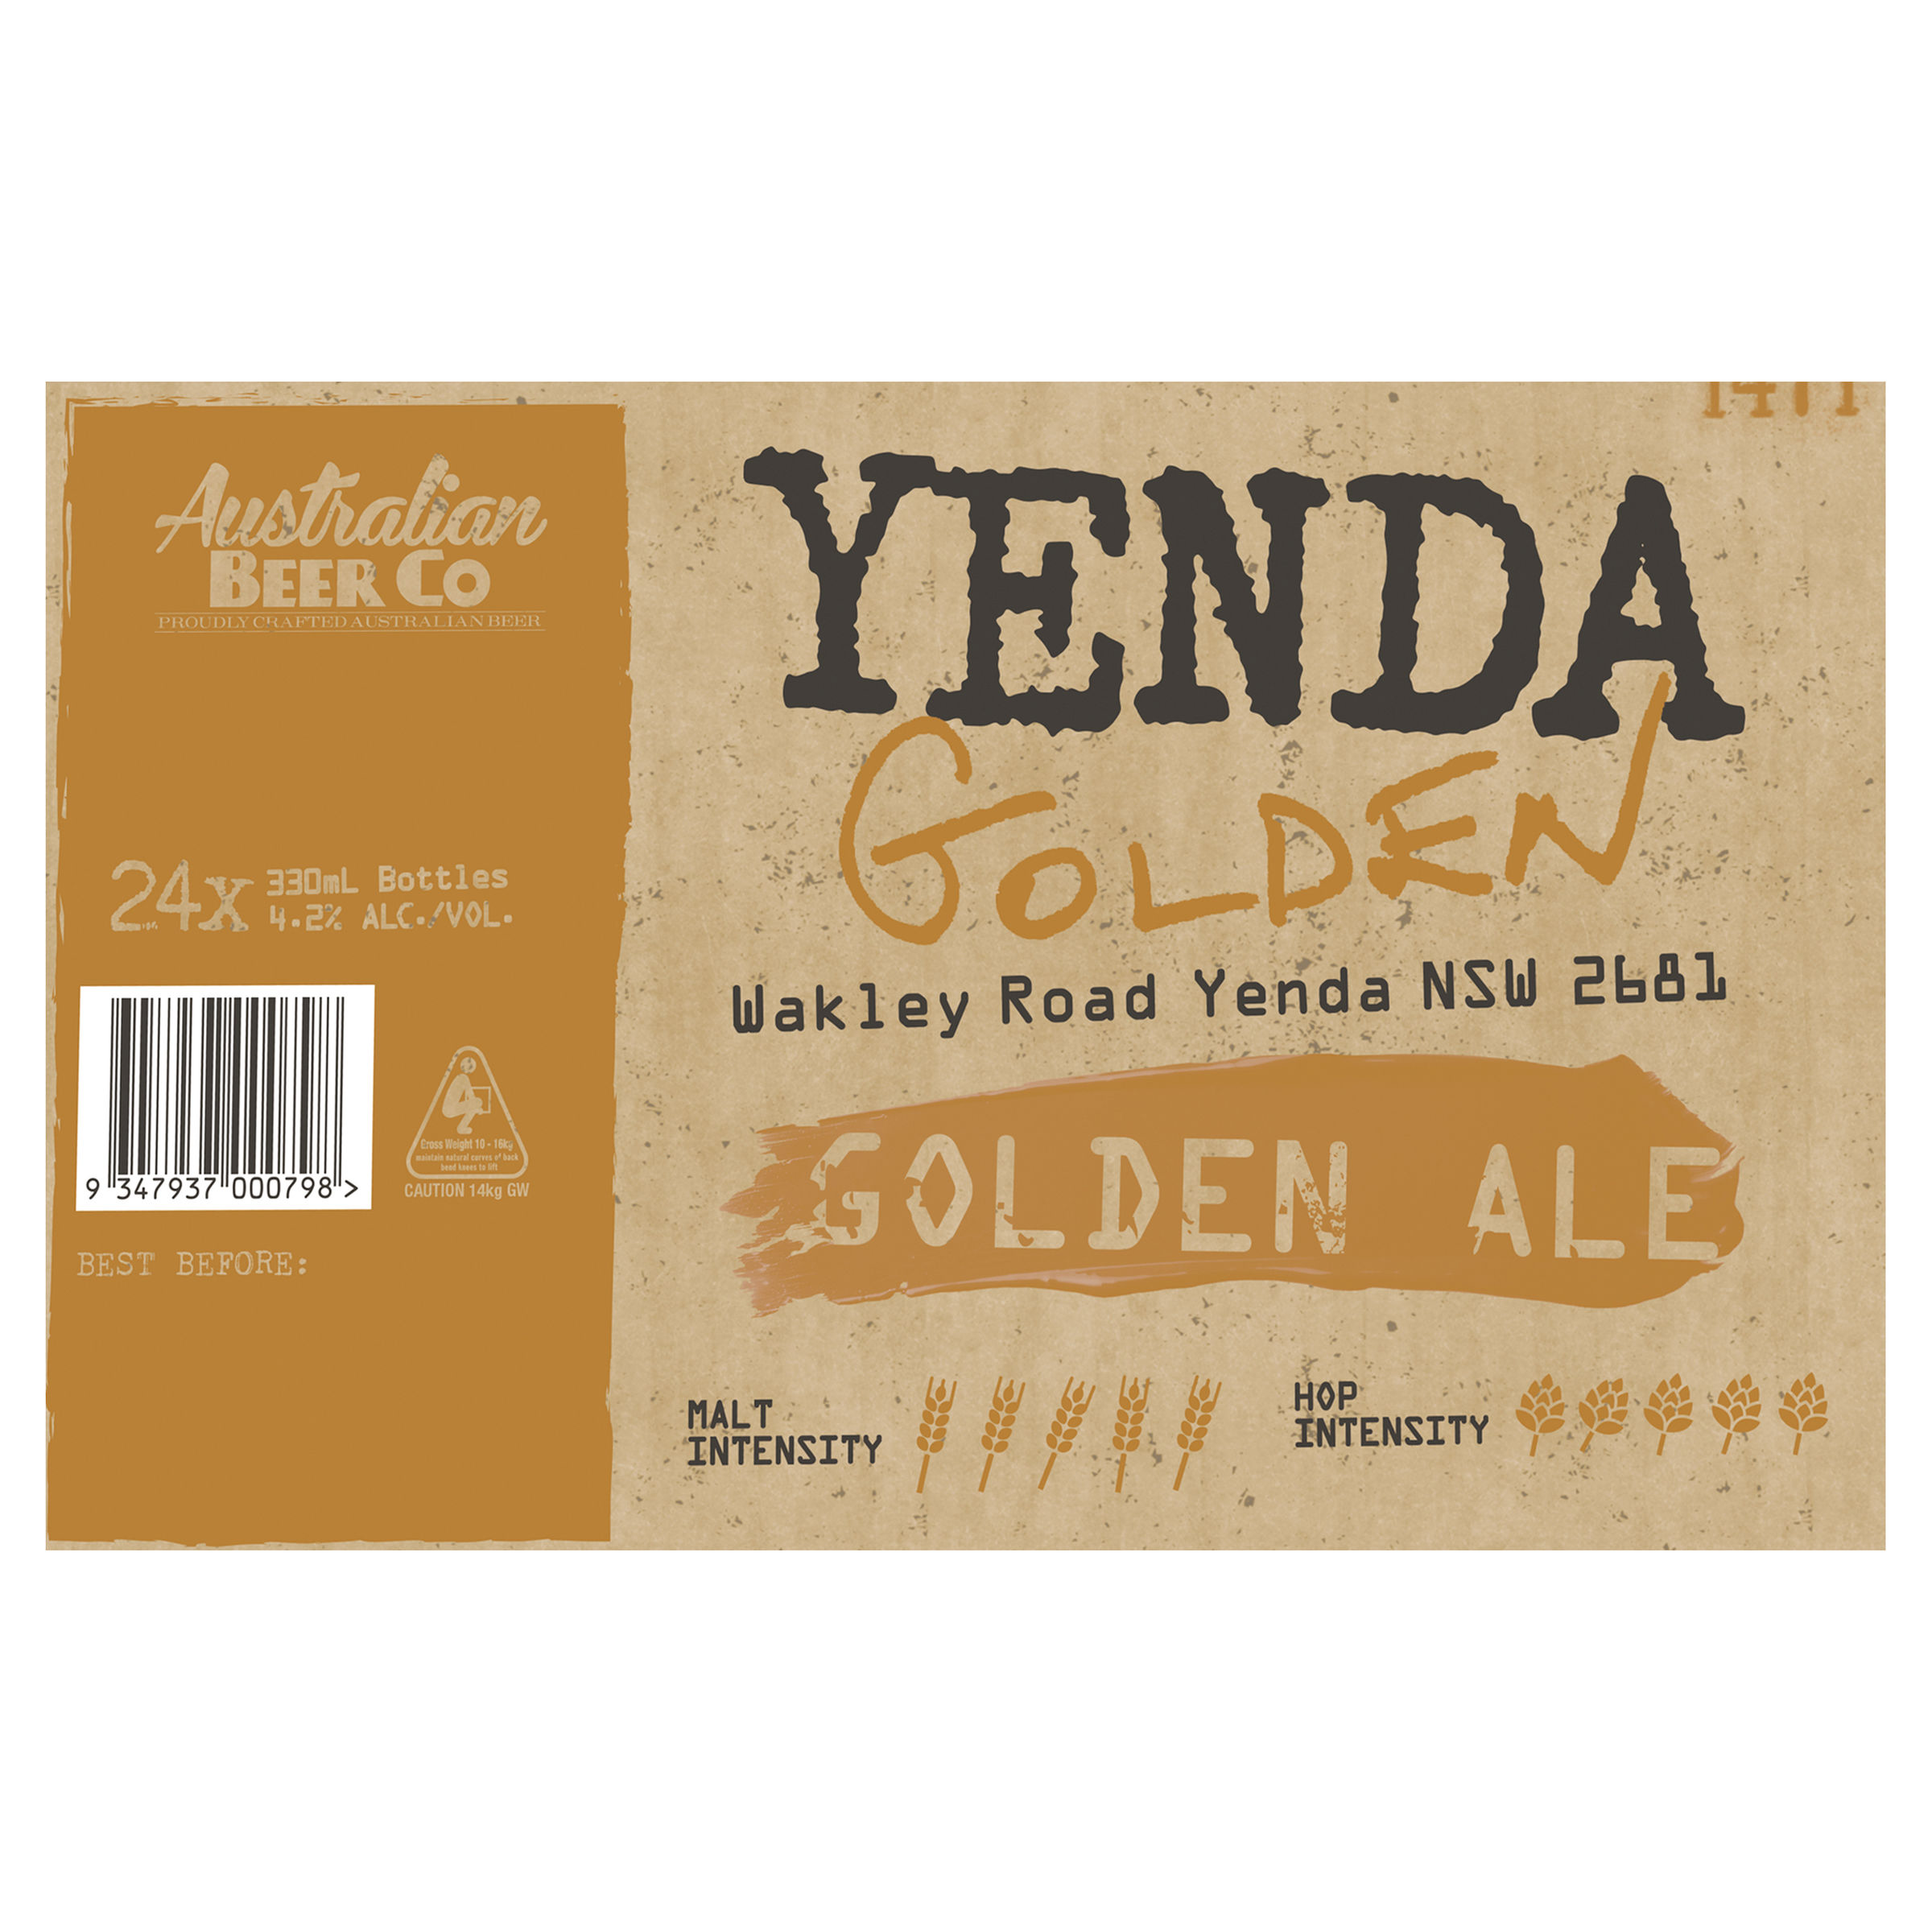 AUSTRALIAN BEER COMPANY YENDA GOLDEN ALE